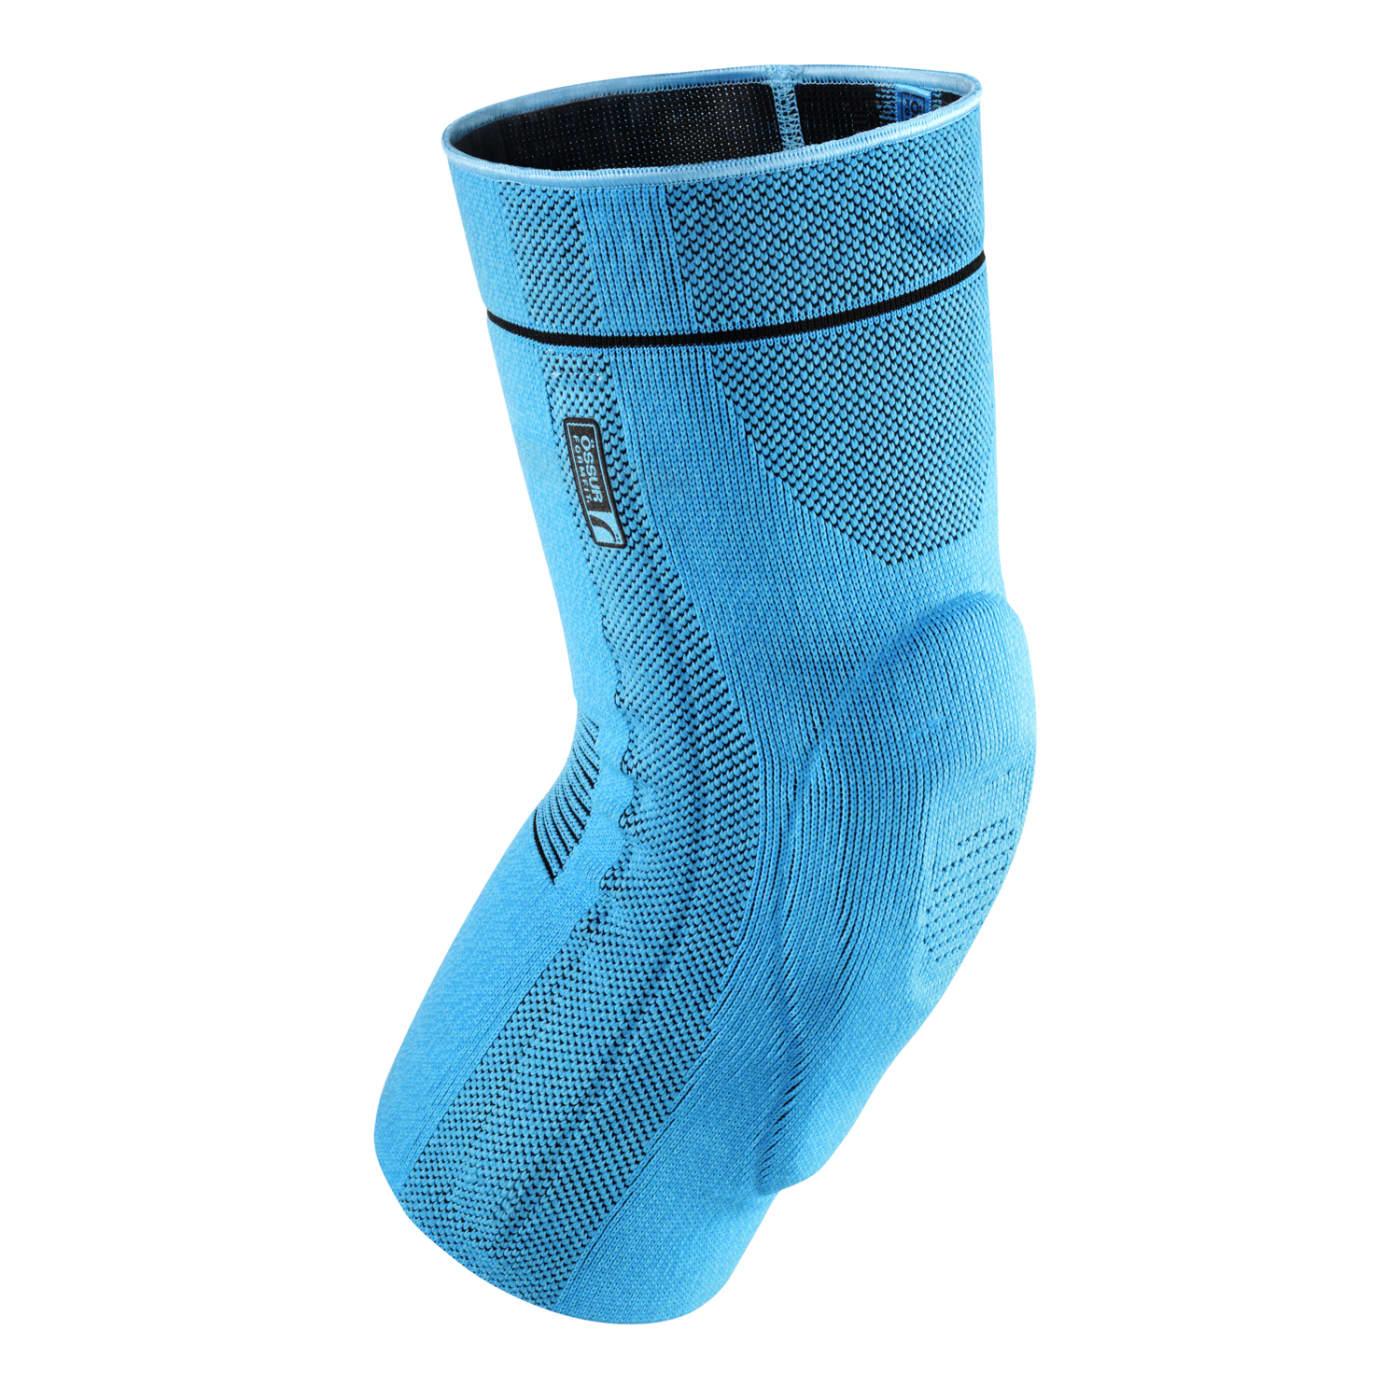 Ossur Formfit Pro Knee